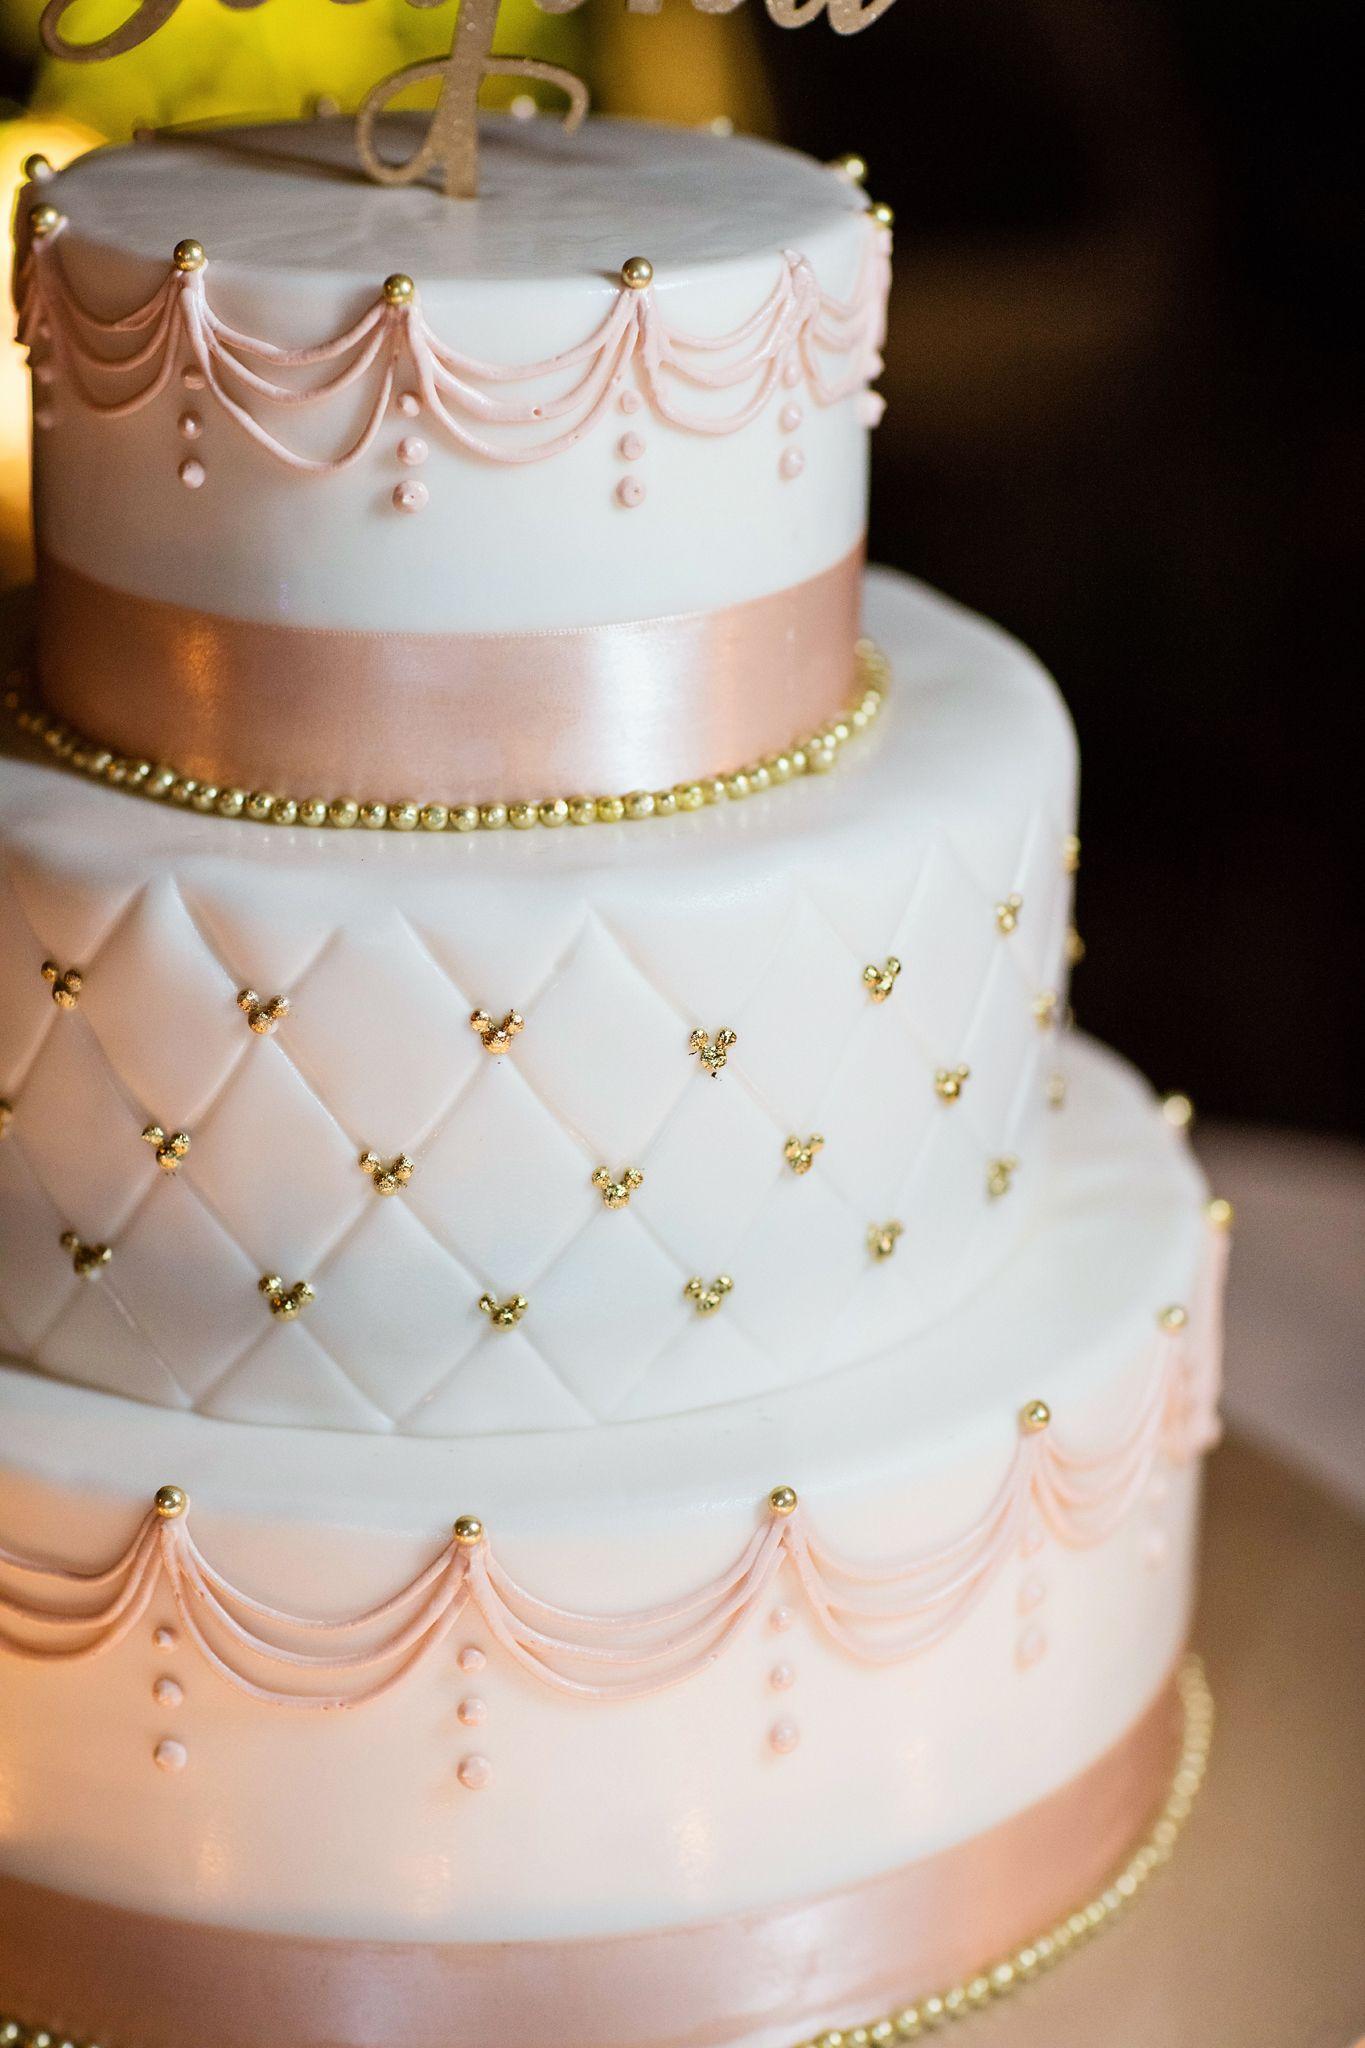 This Disneyland Wedding Cake Is Pretty In Blush